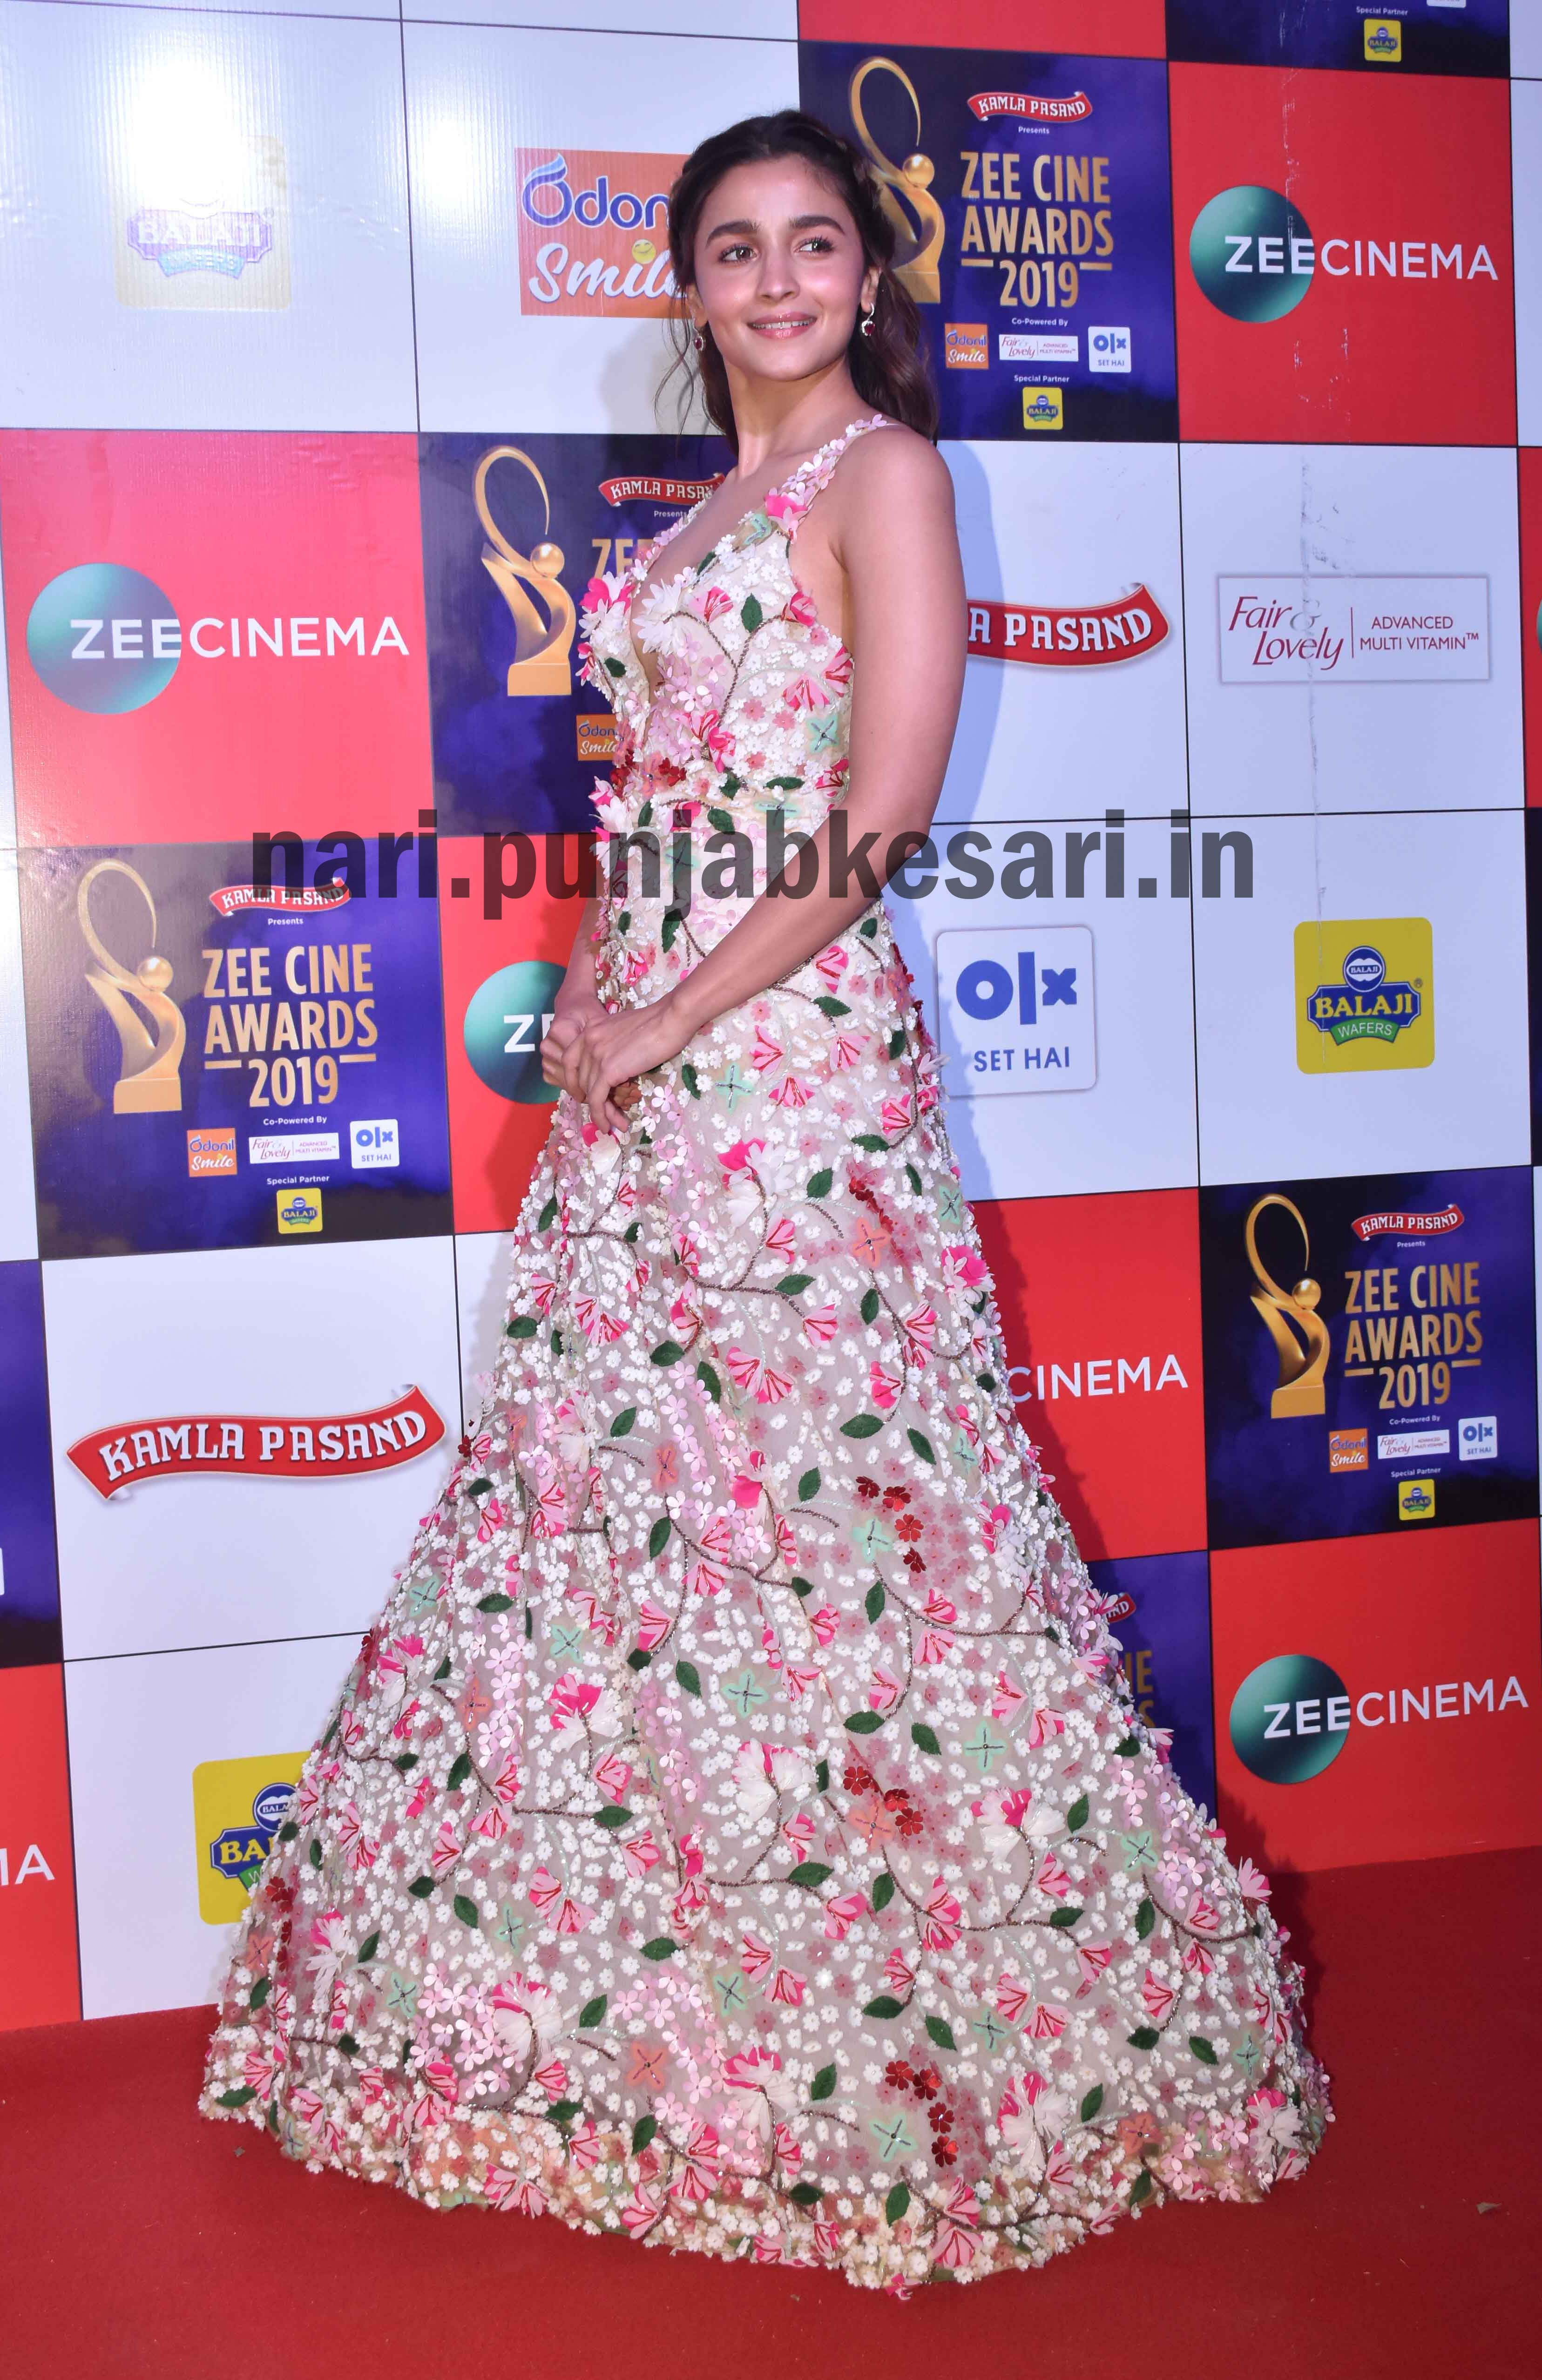 PunjabKesari, Alia bhatt at zee cineama awards